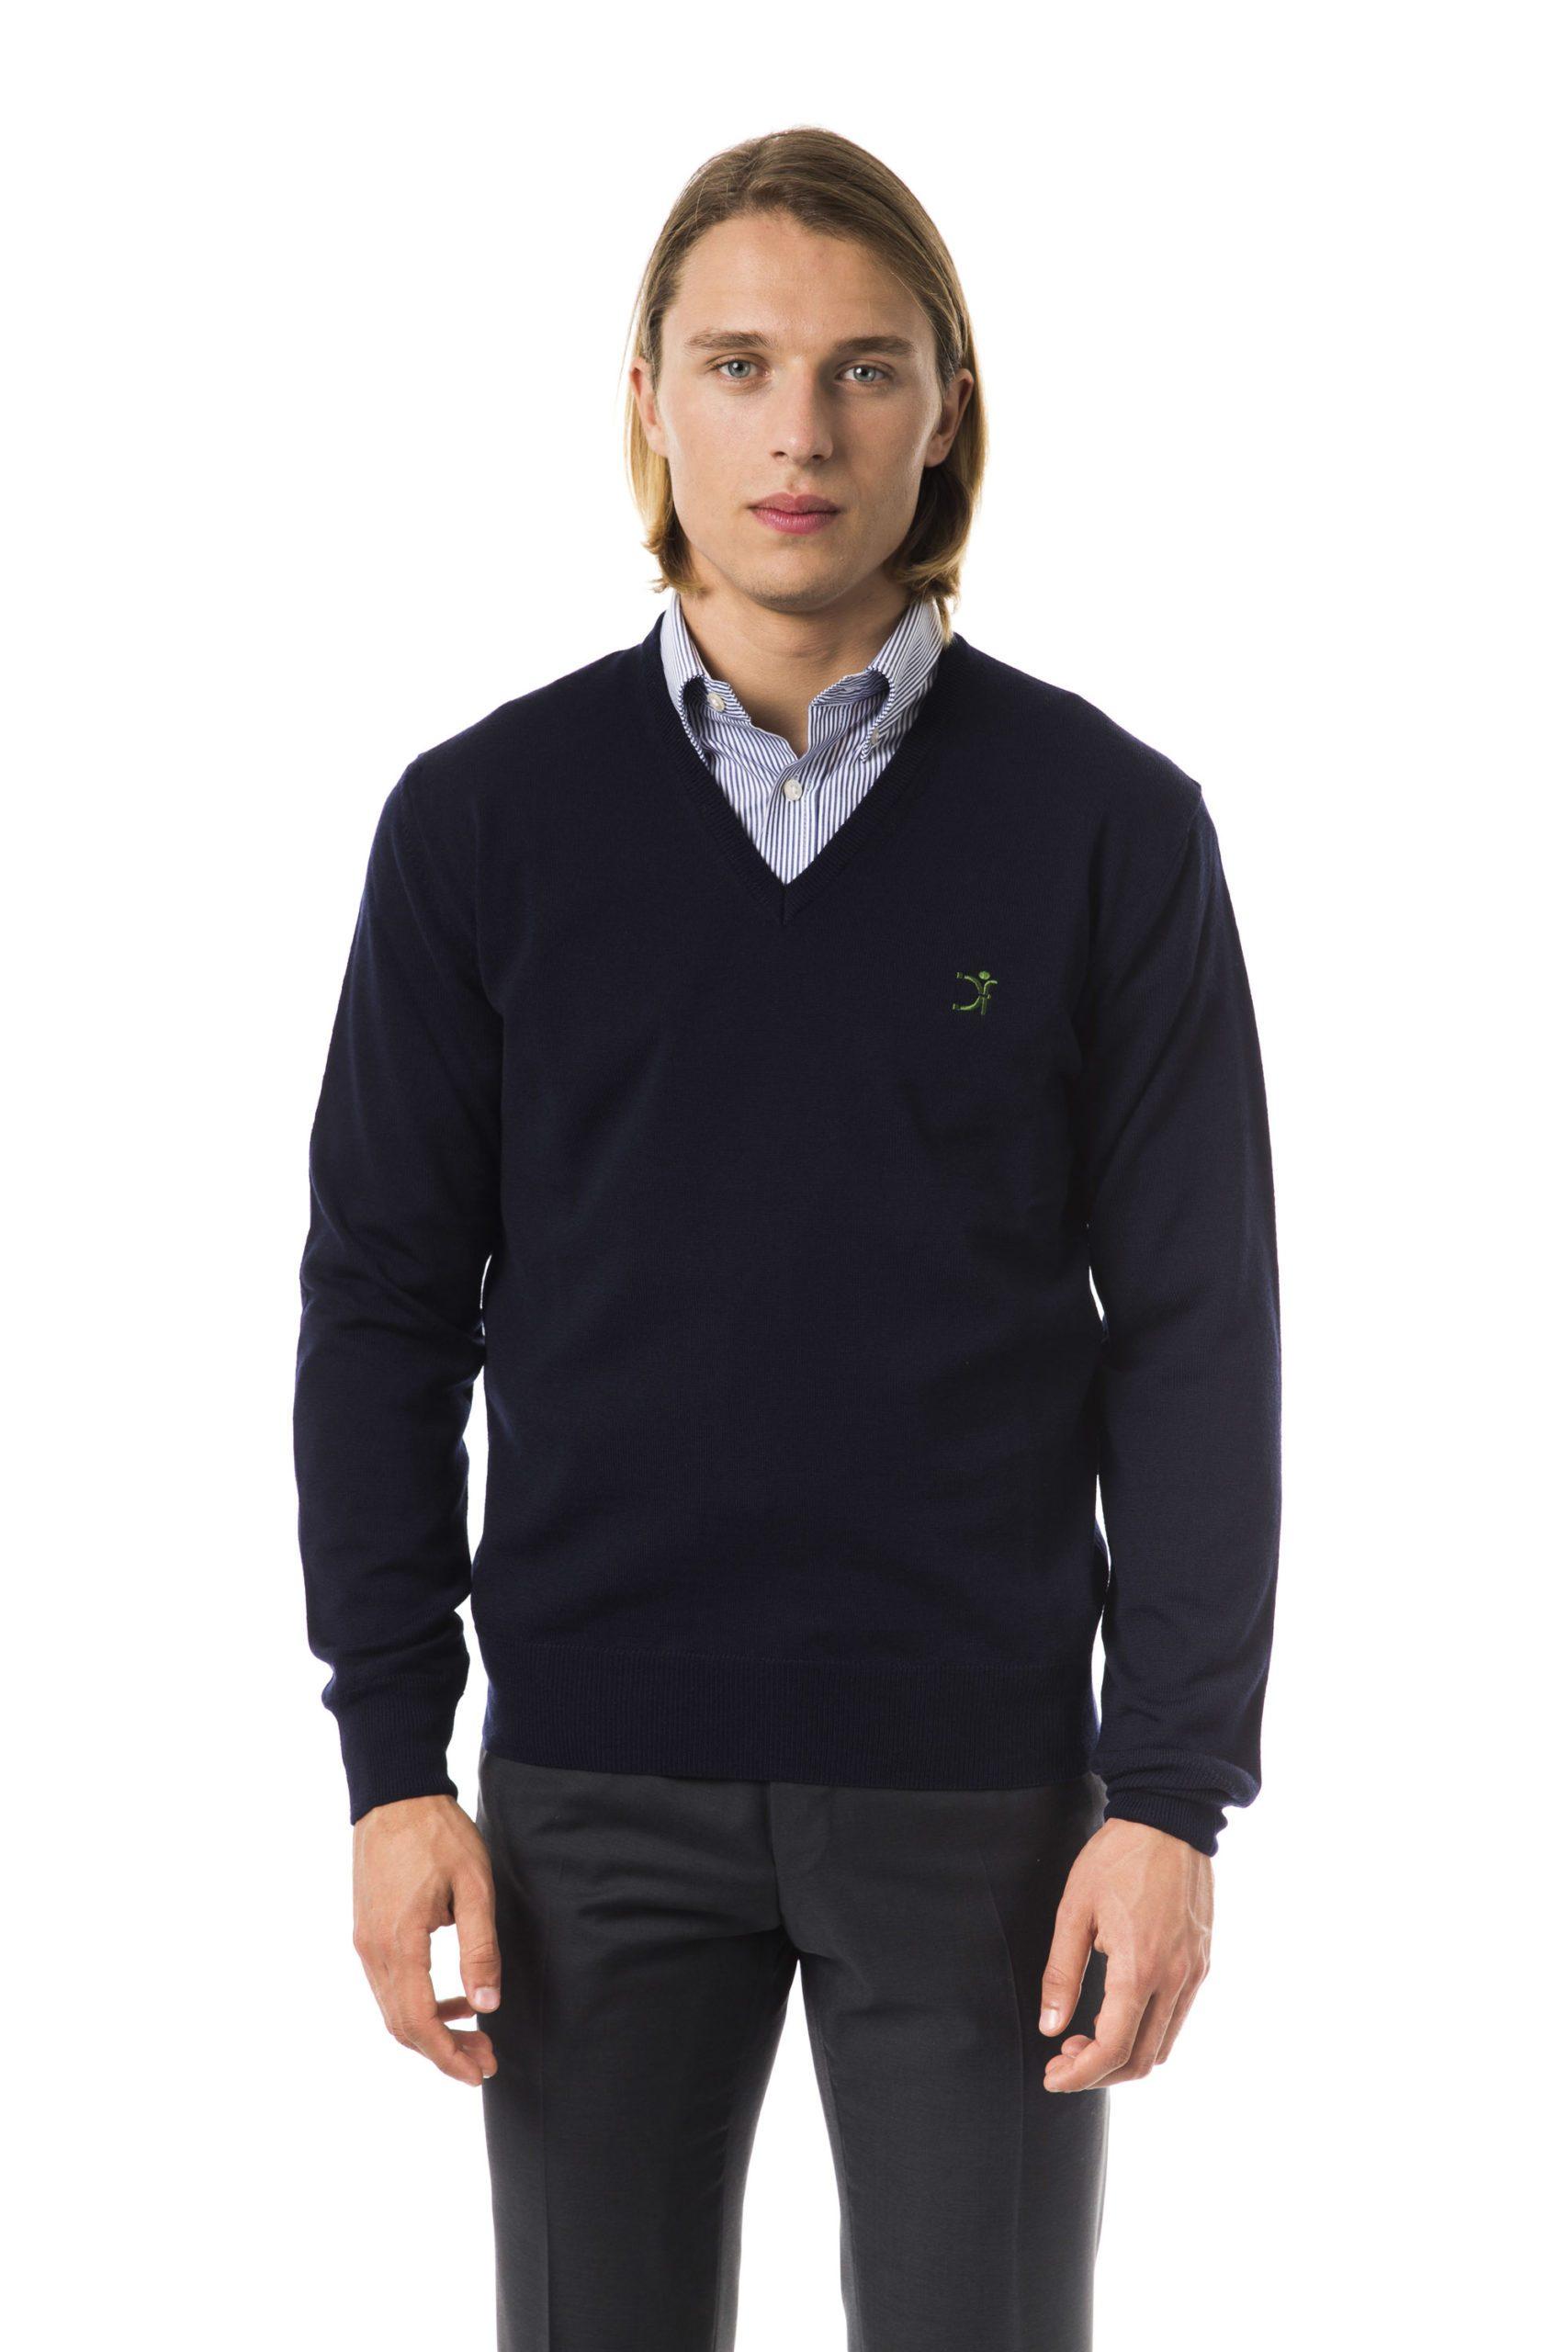 Uominitaliani Men's Sweater Blue UO816610 - XS